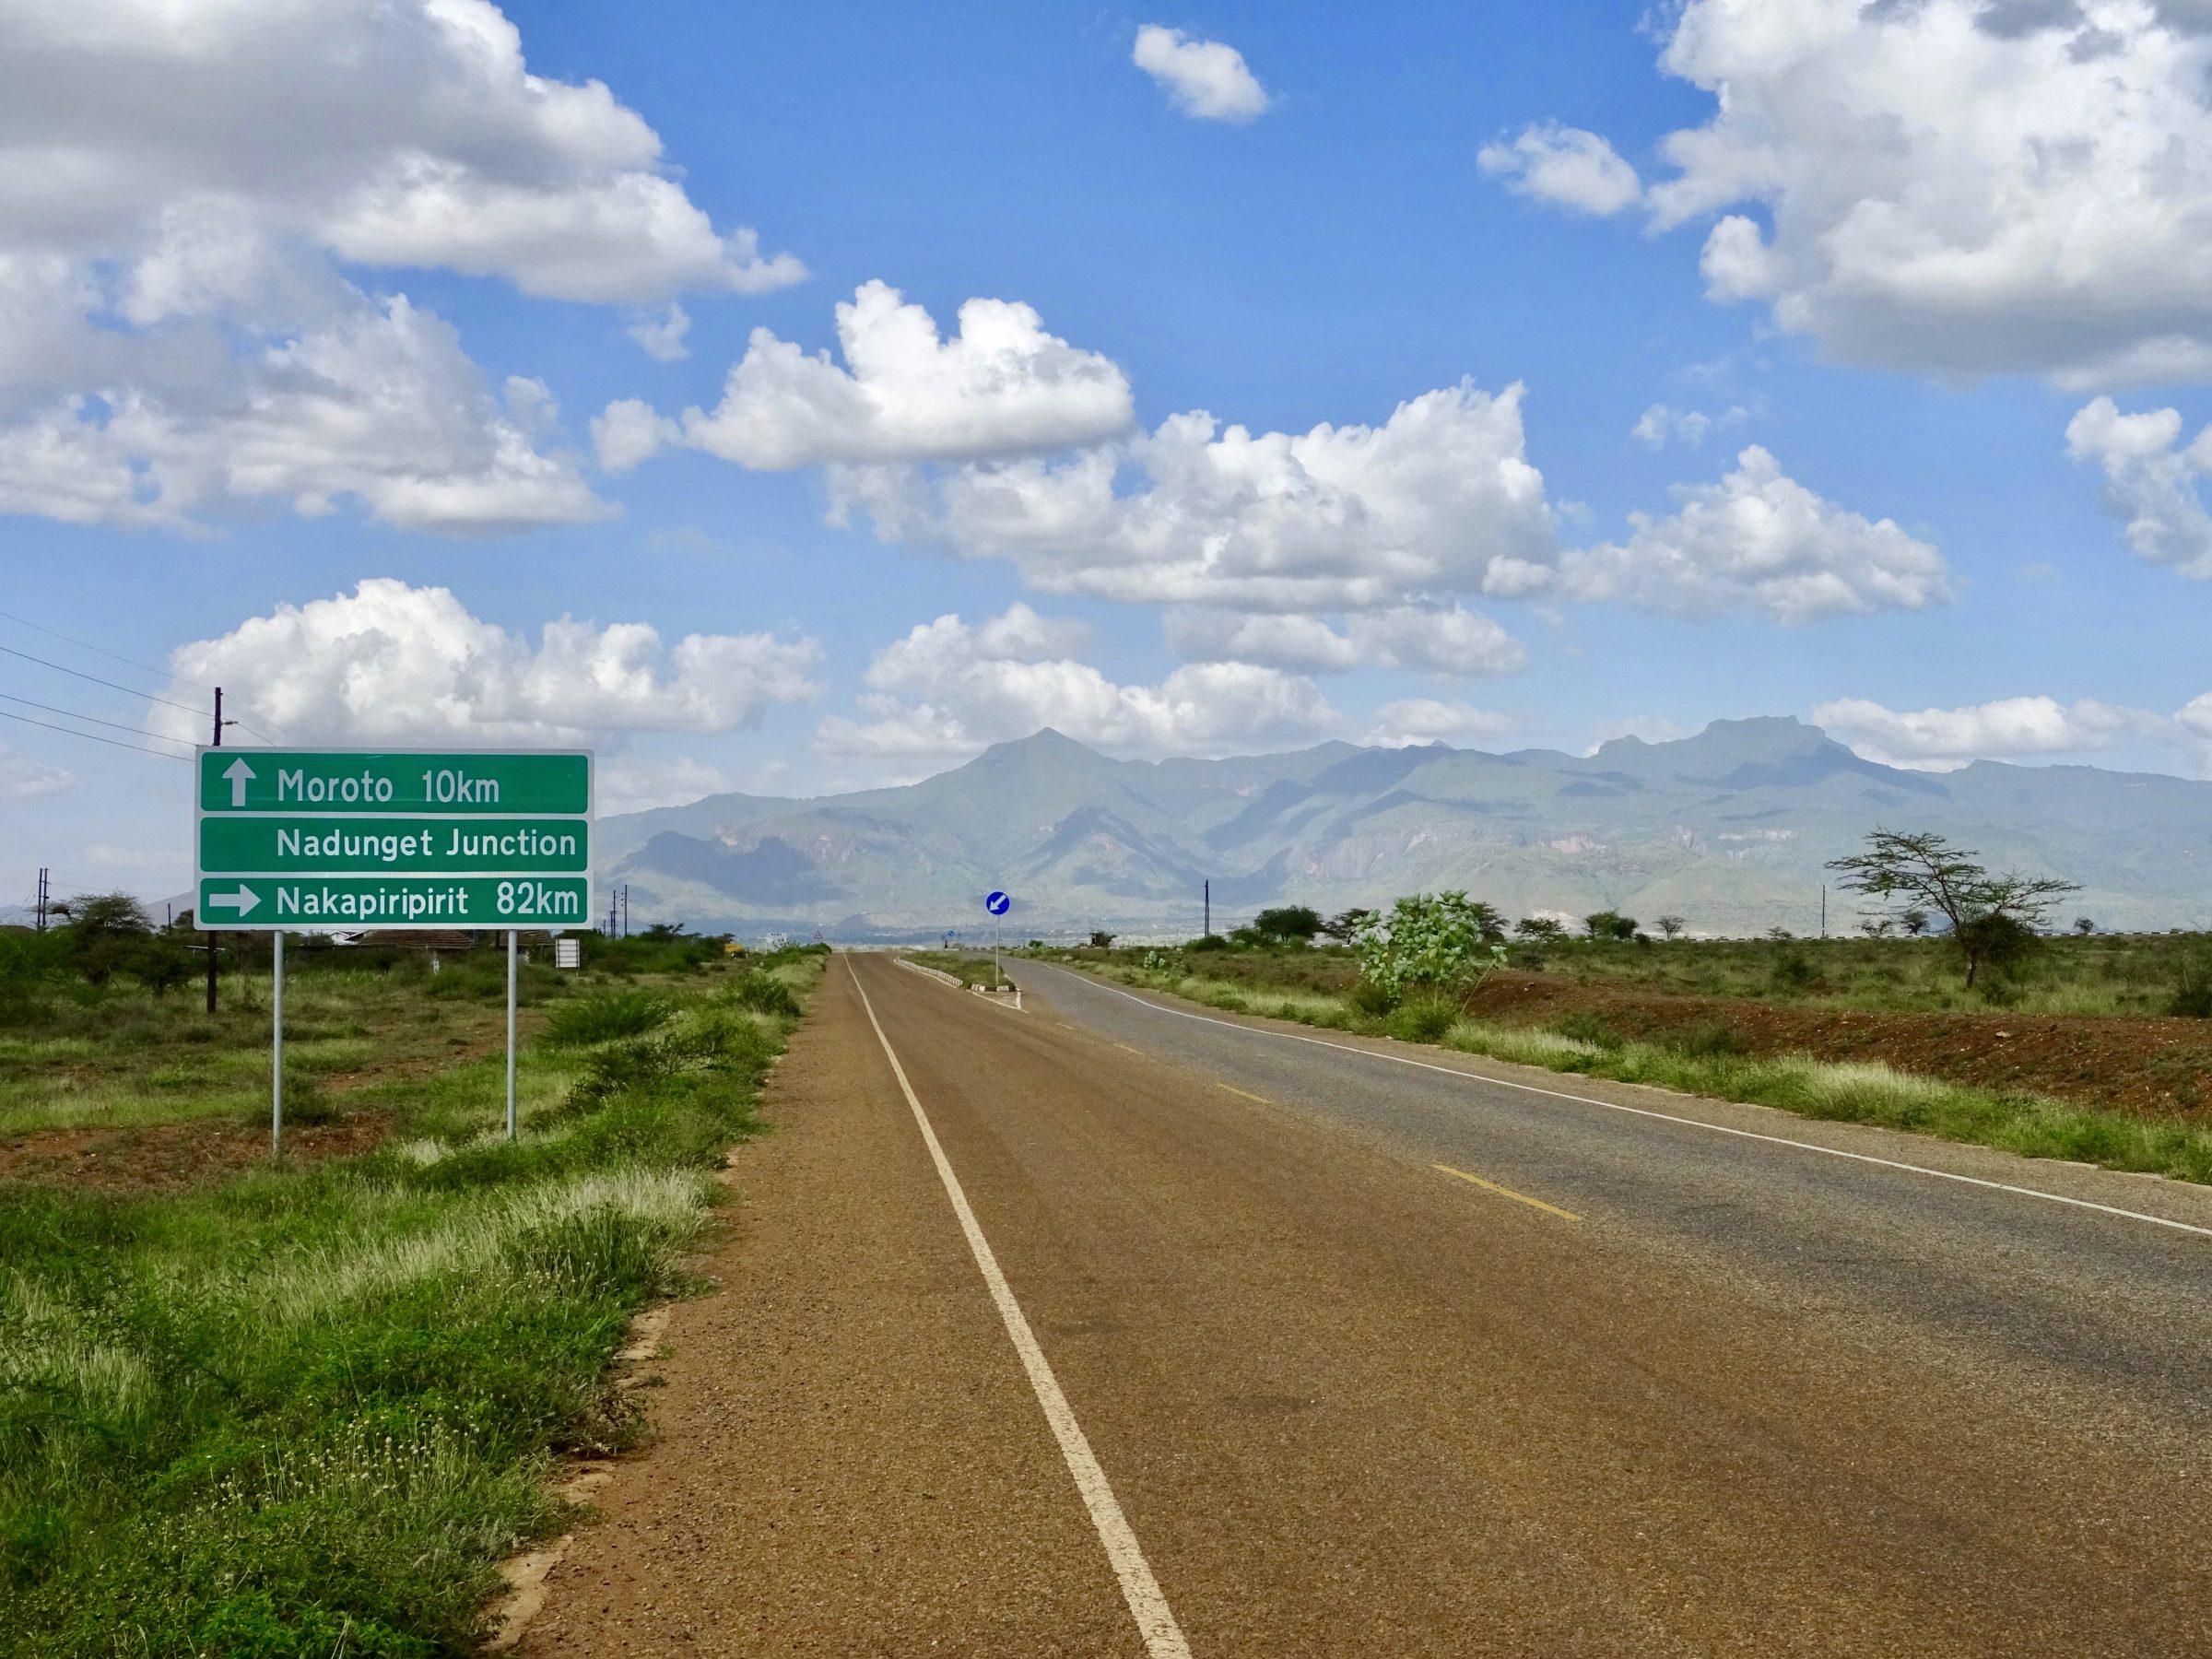 Nog 10 kilometer naar Moroto